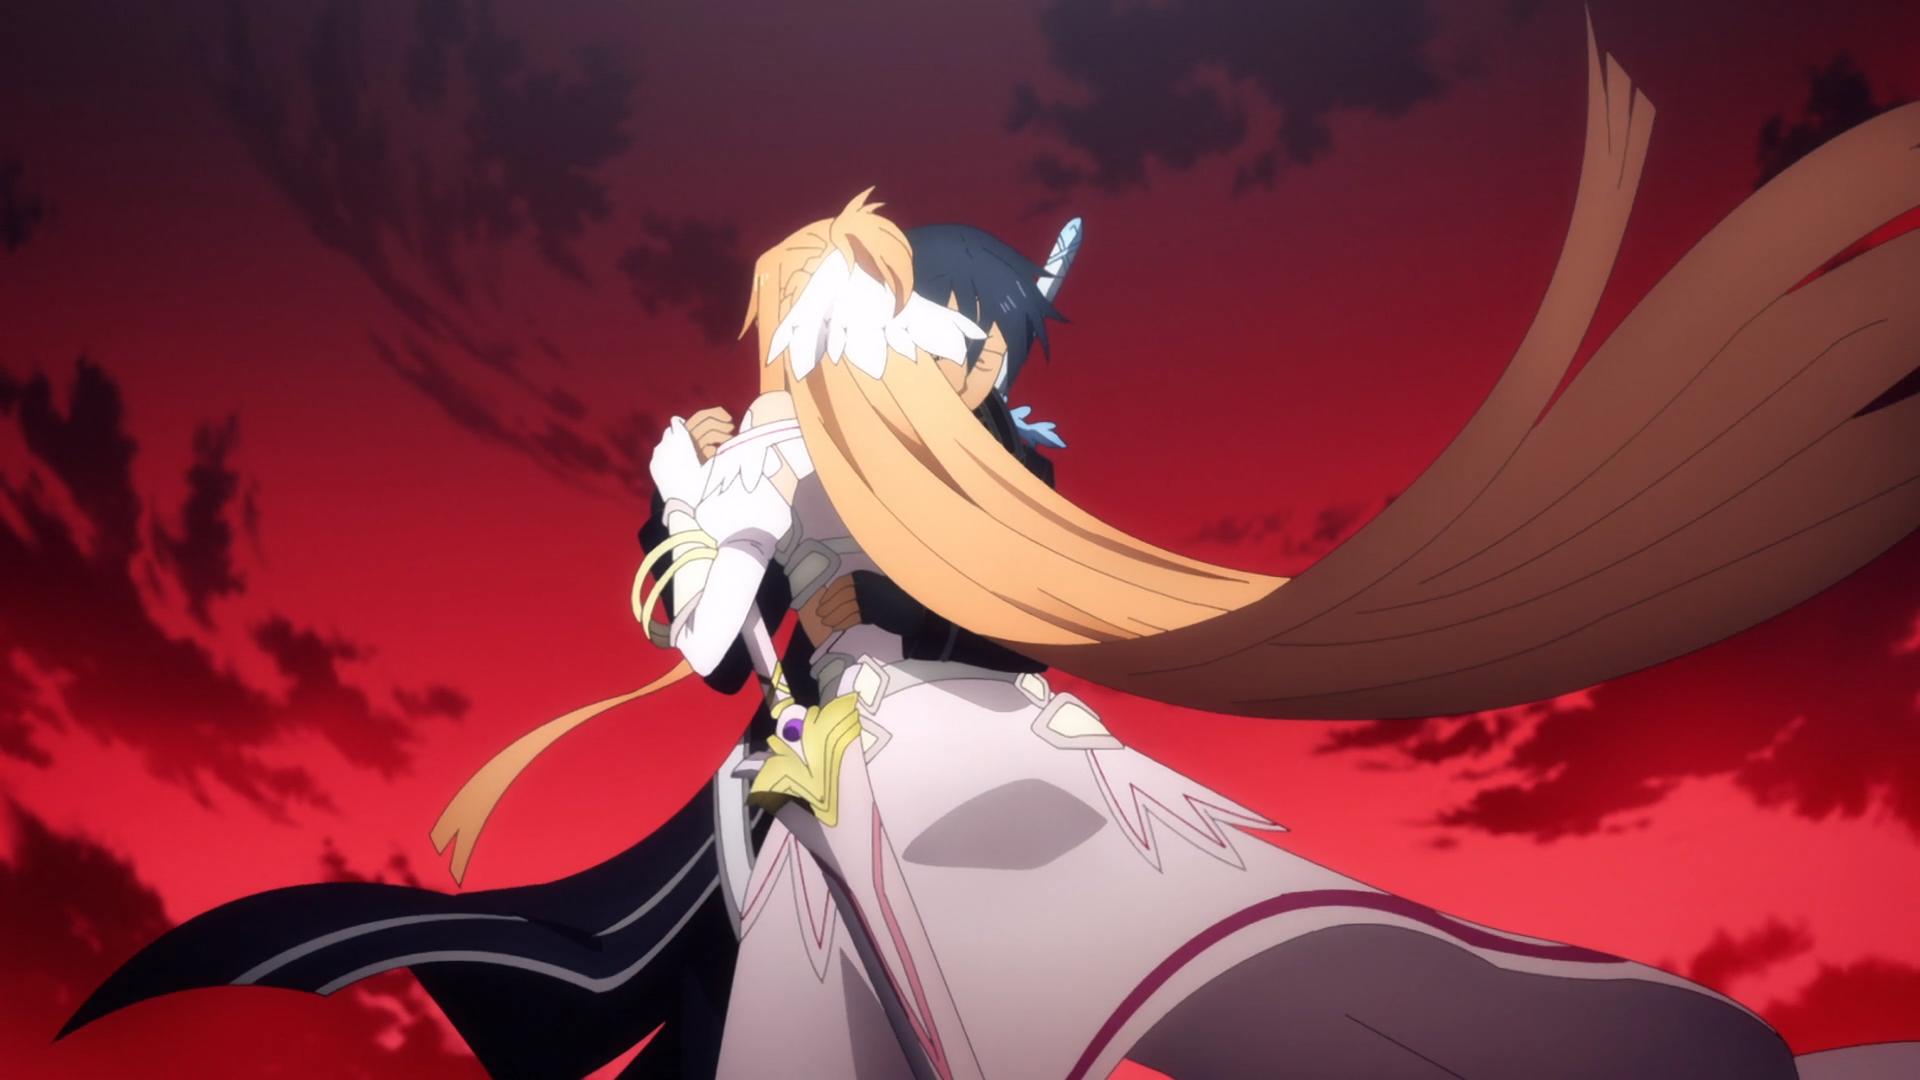 Sword Art Alicization - Kirito and Asuna Reunited